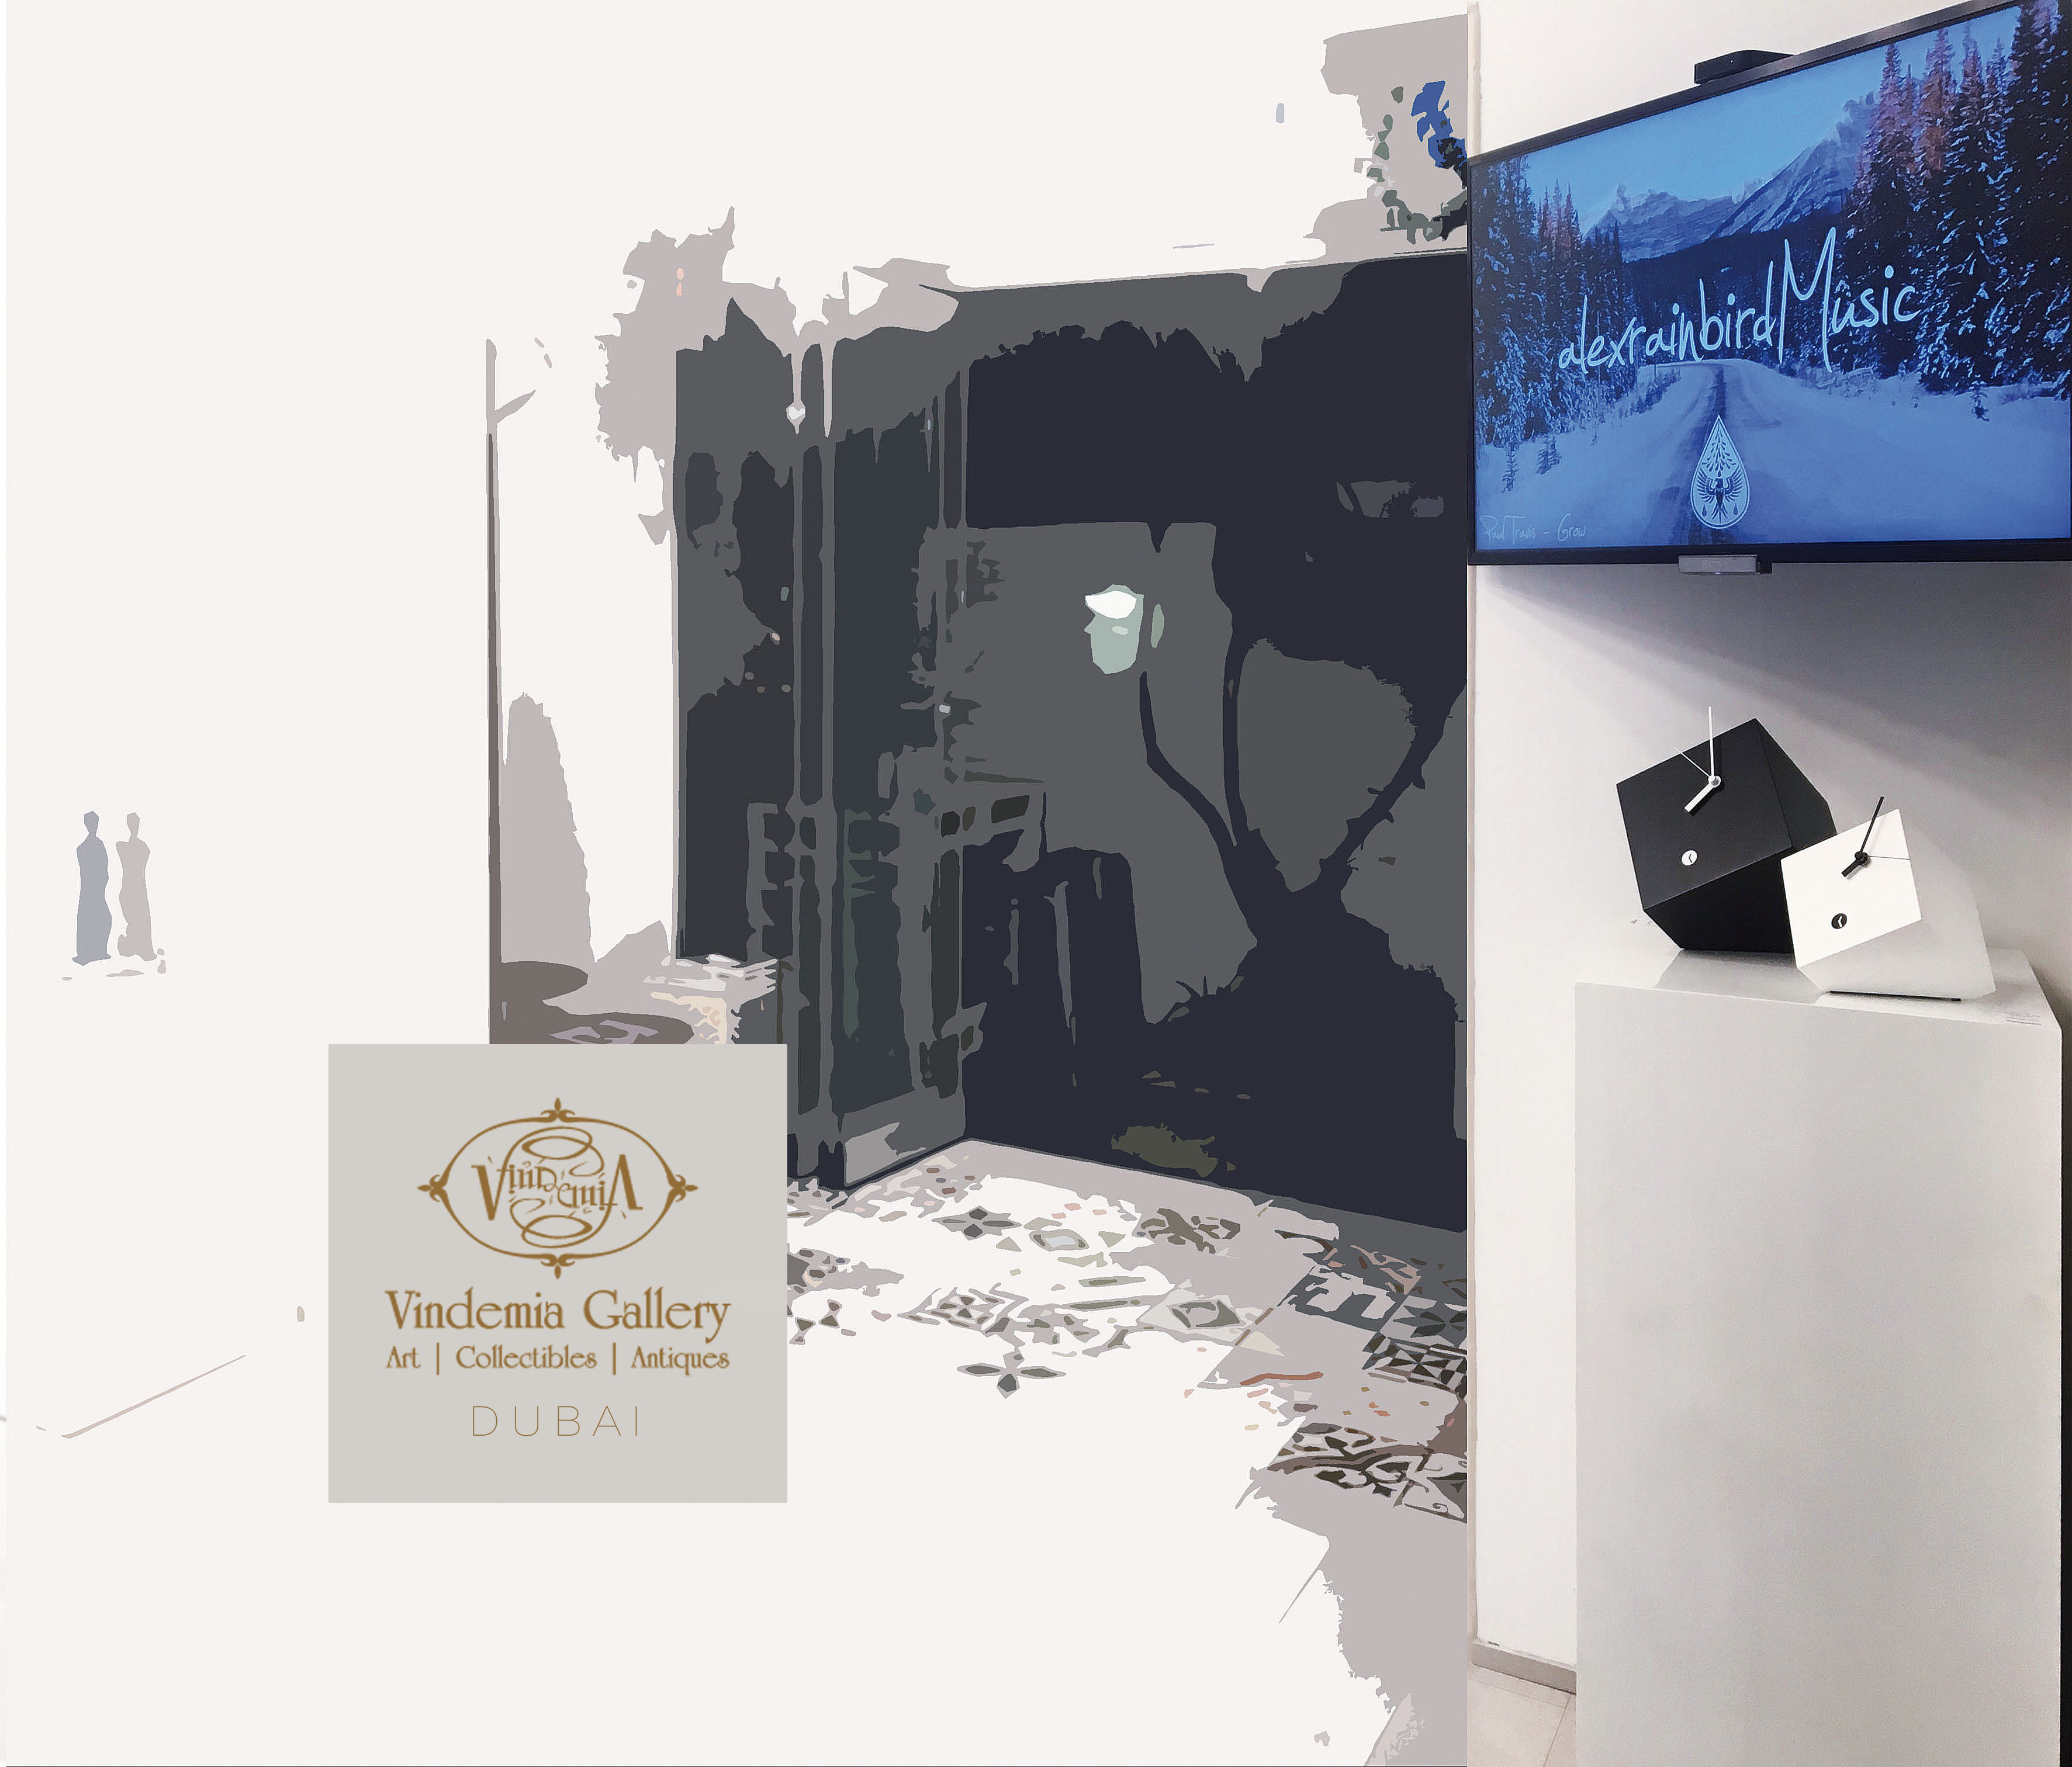 Dubai Gallery Text